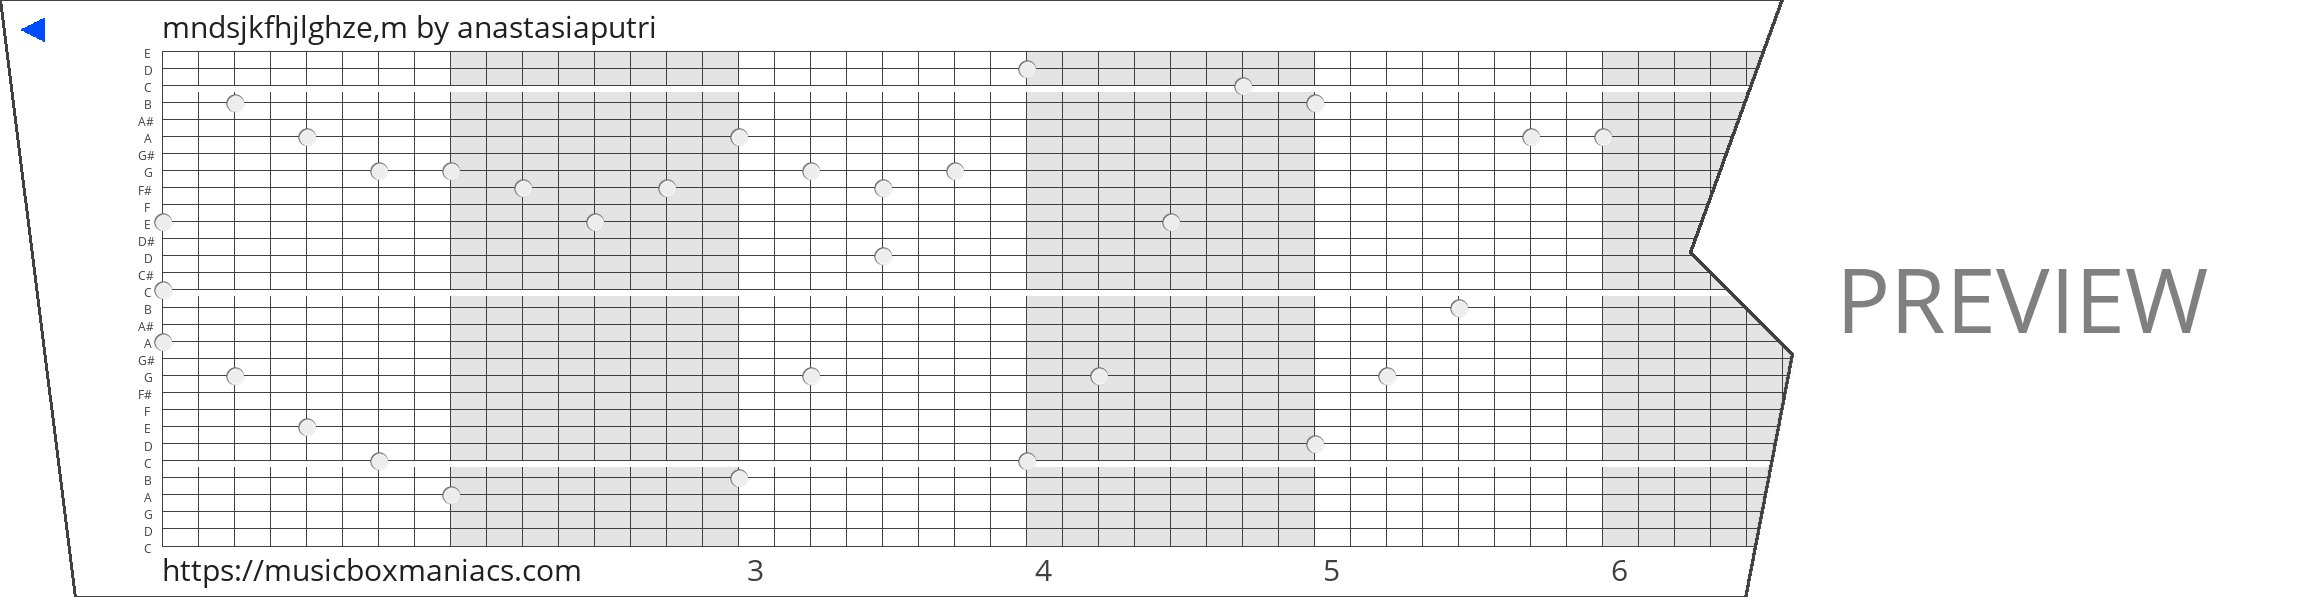 mndsjkfhjlghze,m 30 note music box paper strip